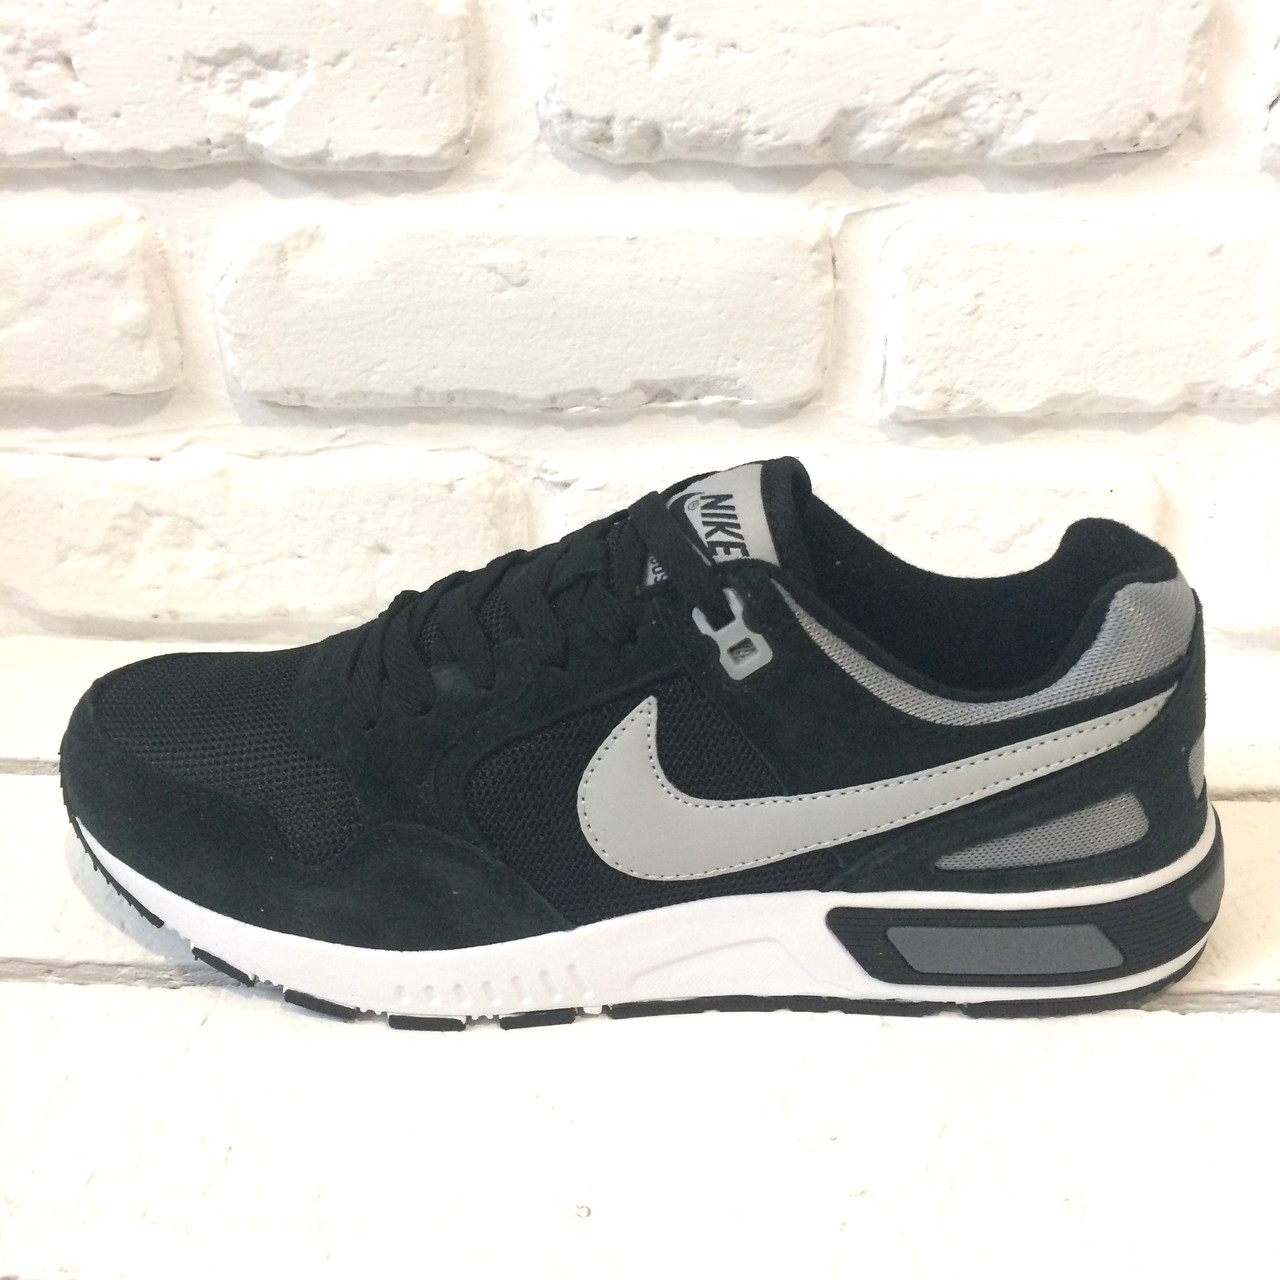 d8d329c49715 Кроссовки Мужские кроссовки Nike Air Max 87 (brown)  продажа, в ...